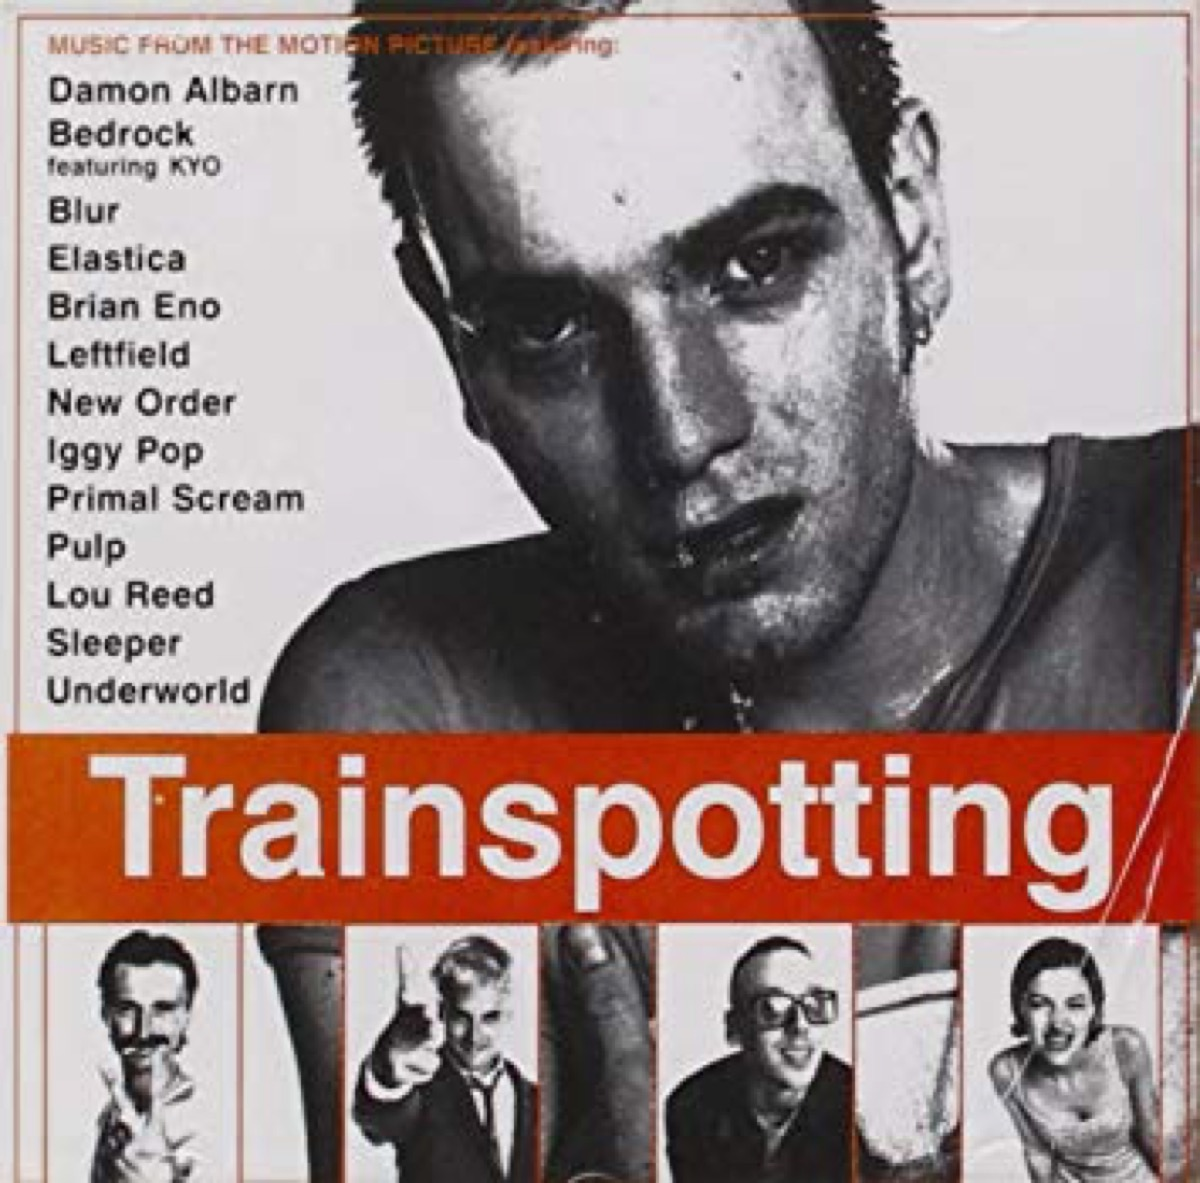 trainspotting movie soundtrack cd cover